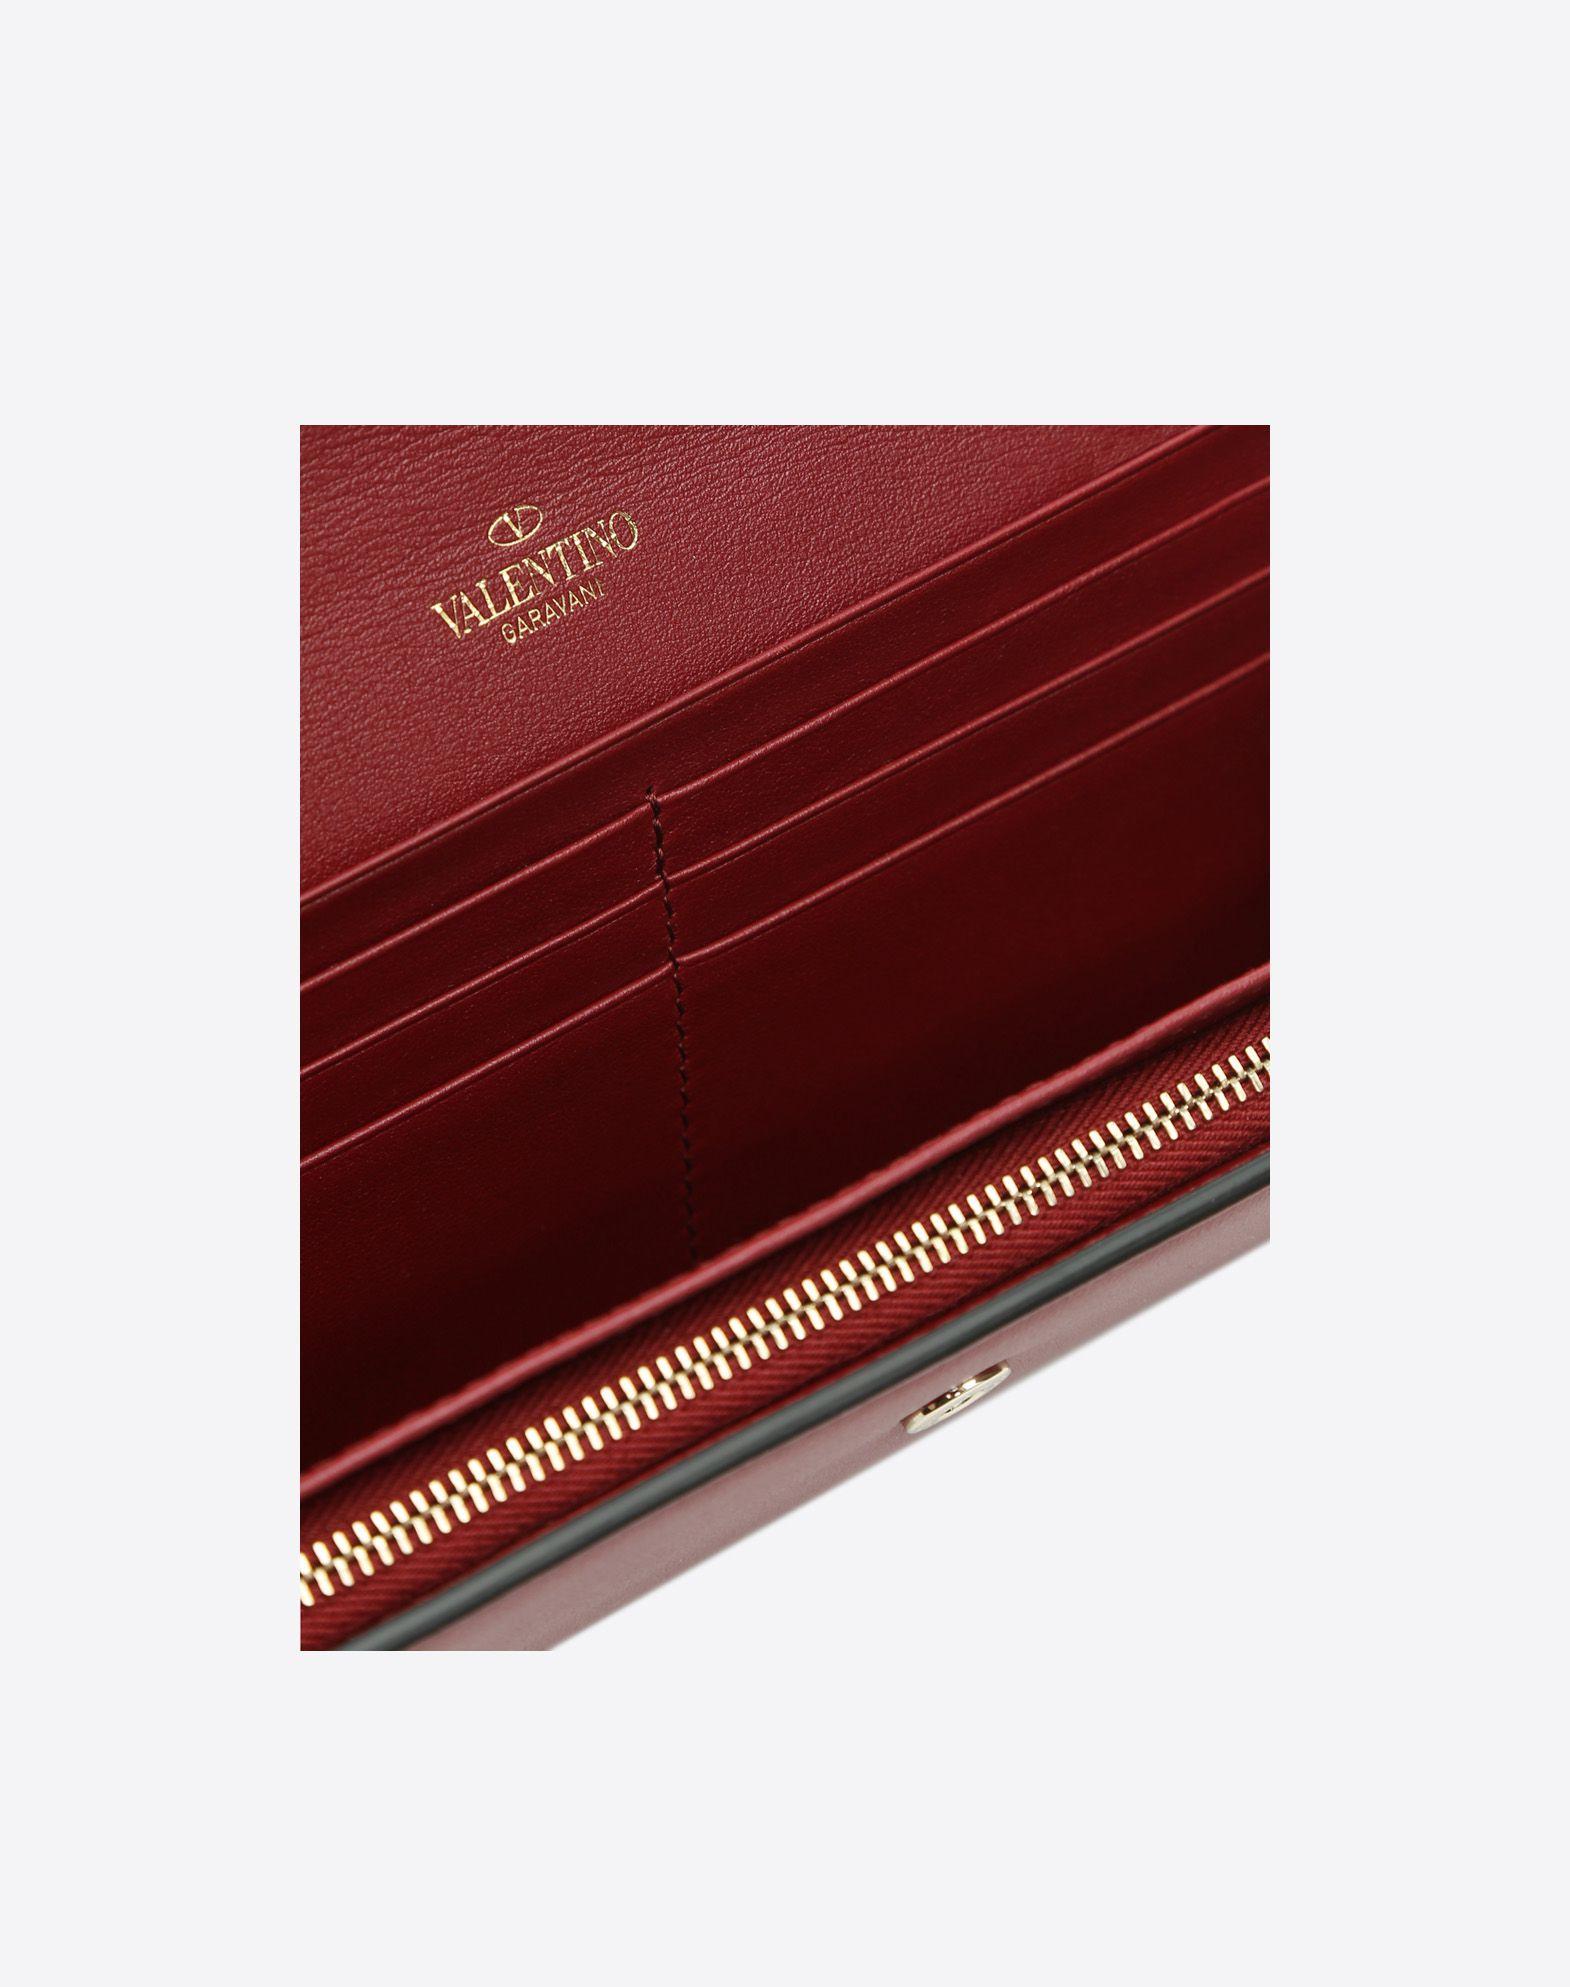 VALENTINO GARAVANI Rockstud Wallet FLAP WALLETS D e